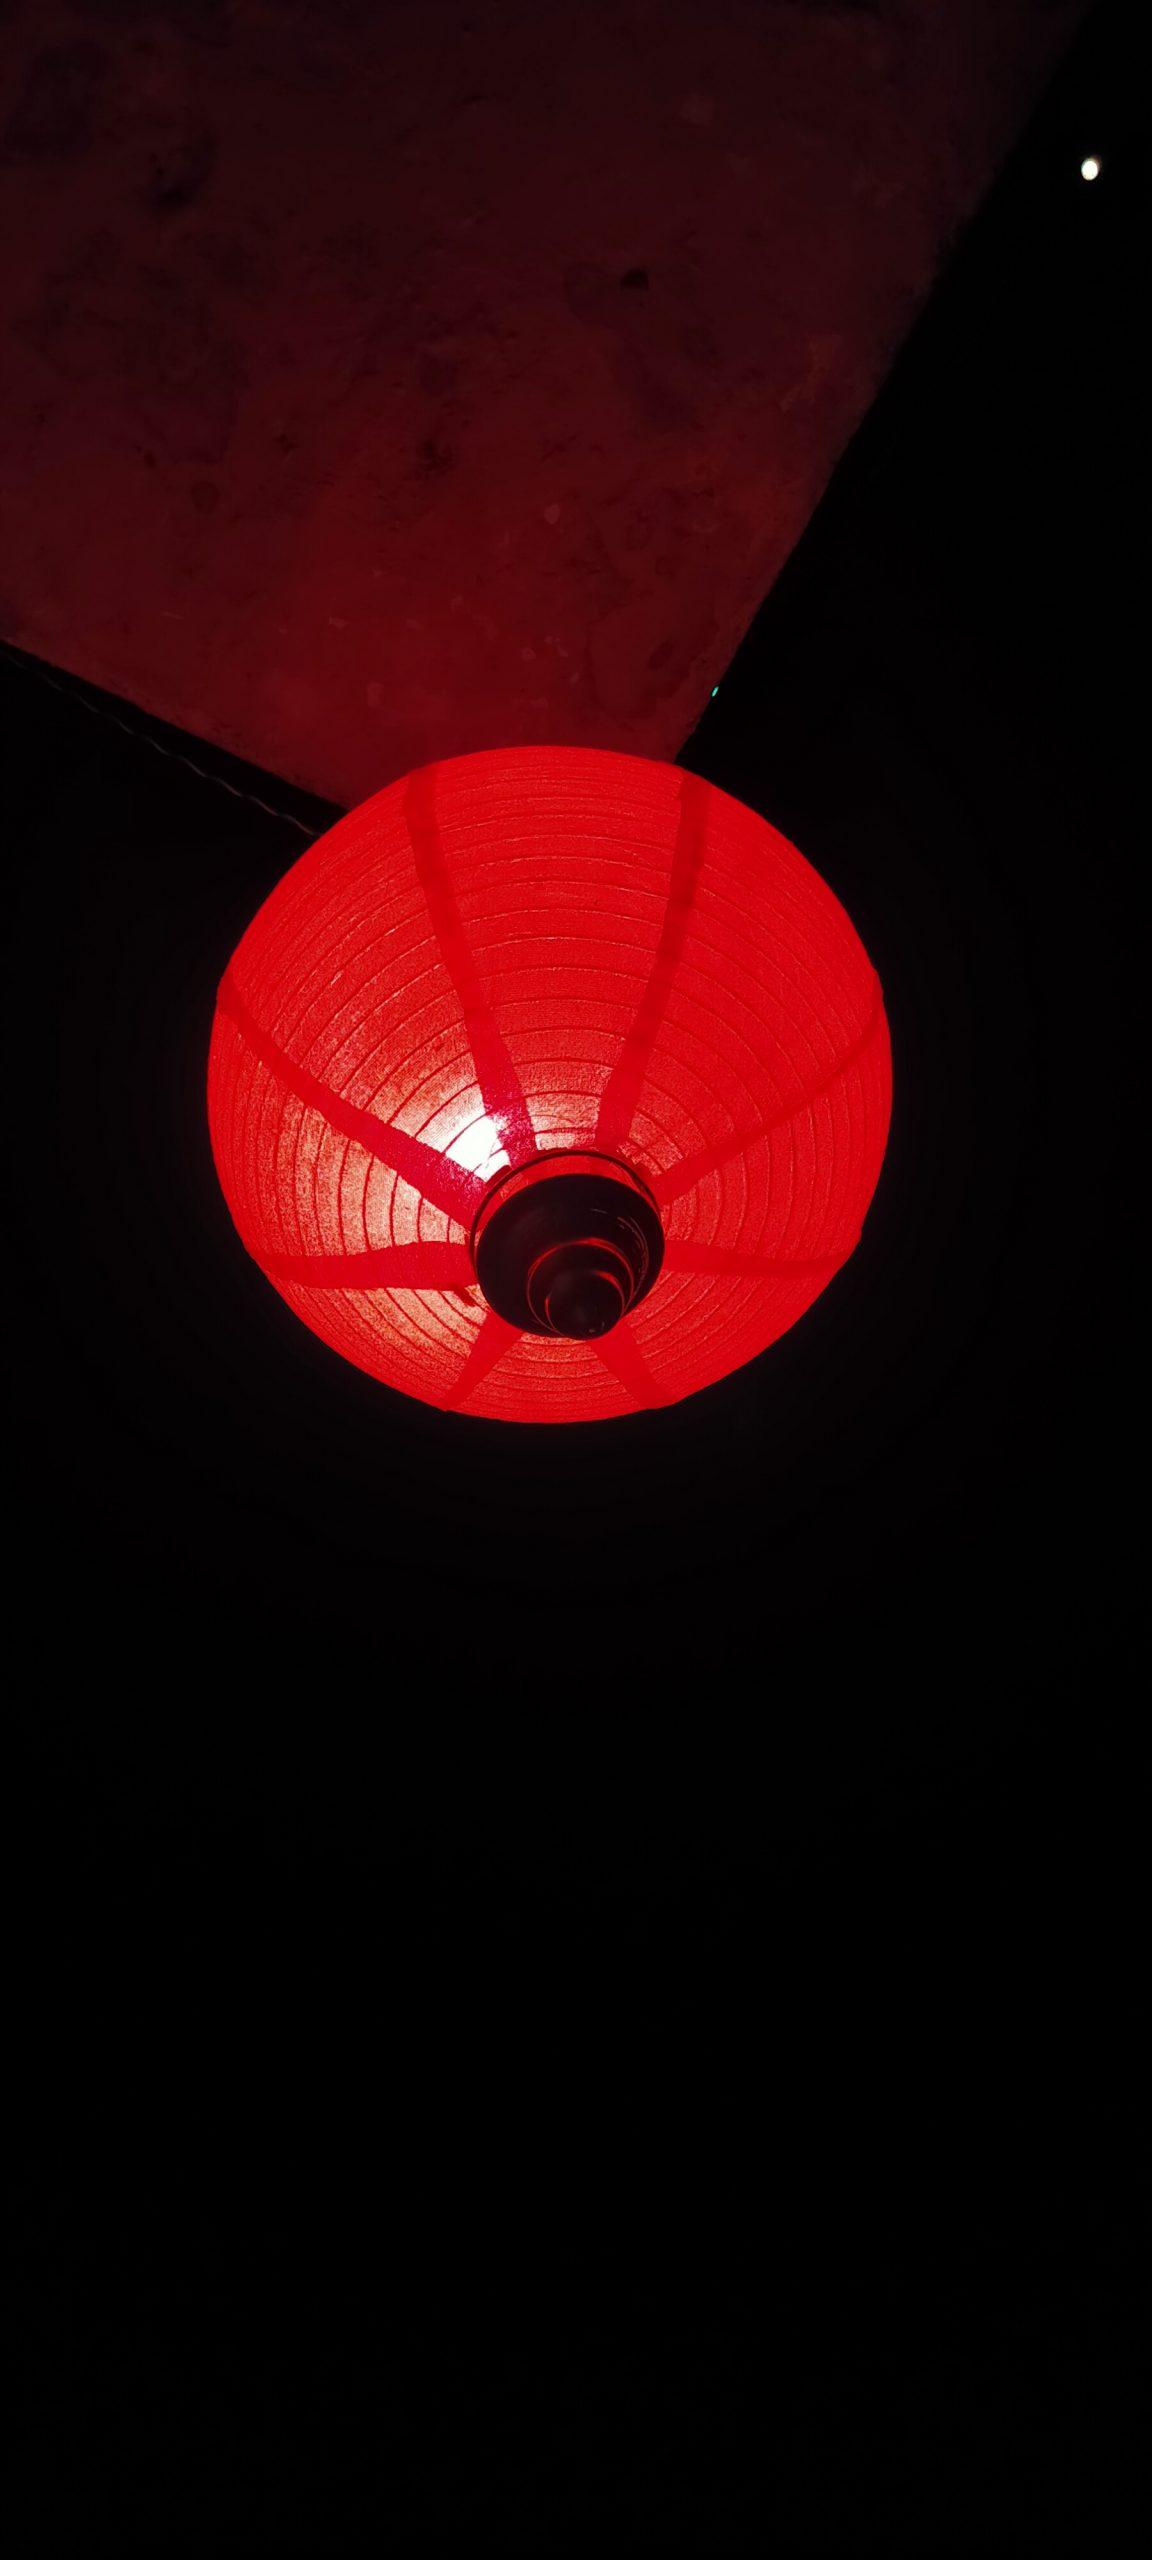 A red light bulb